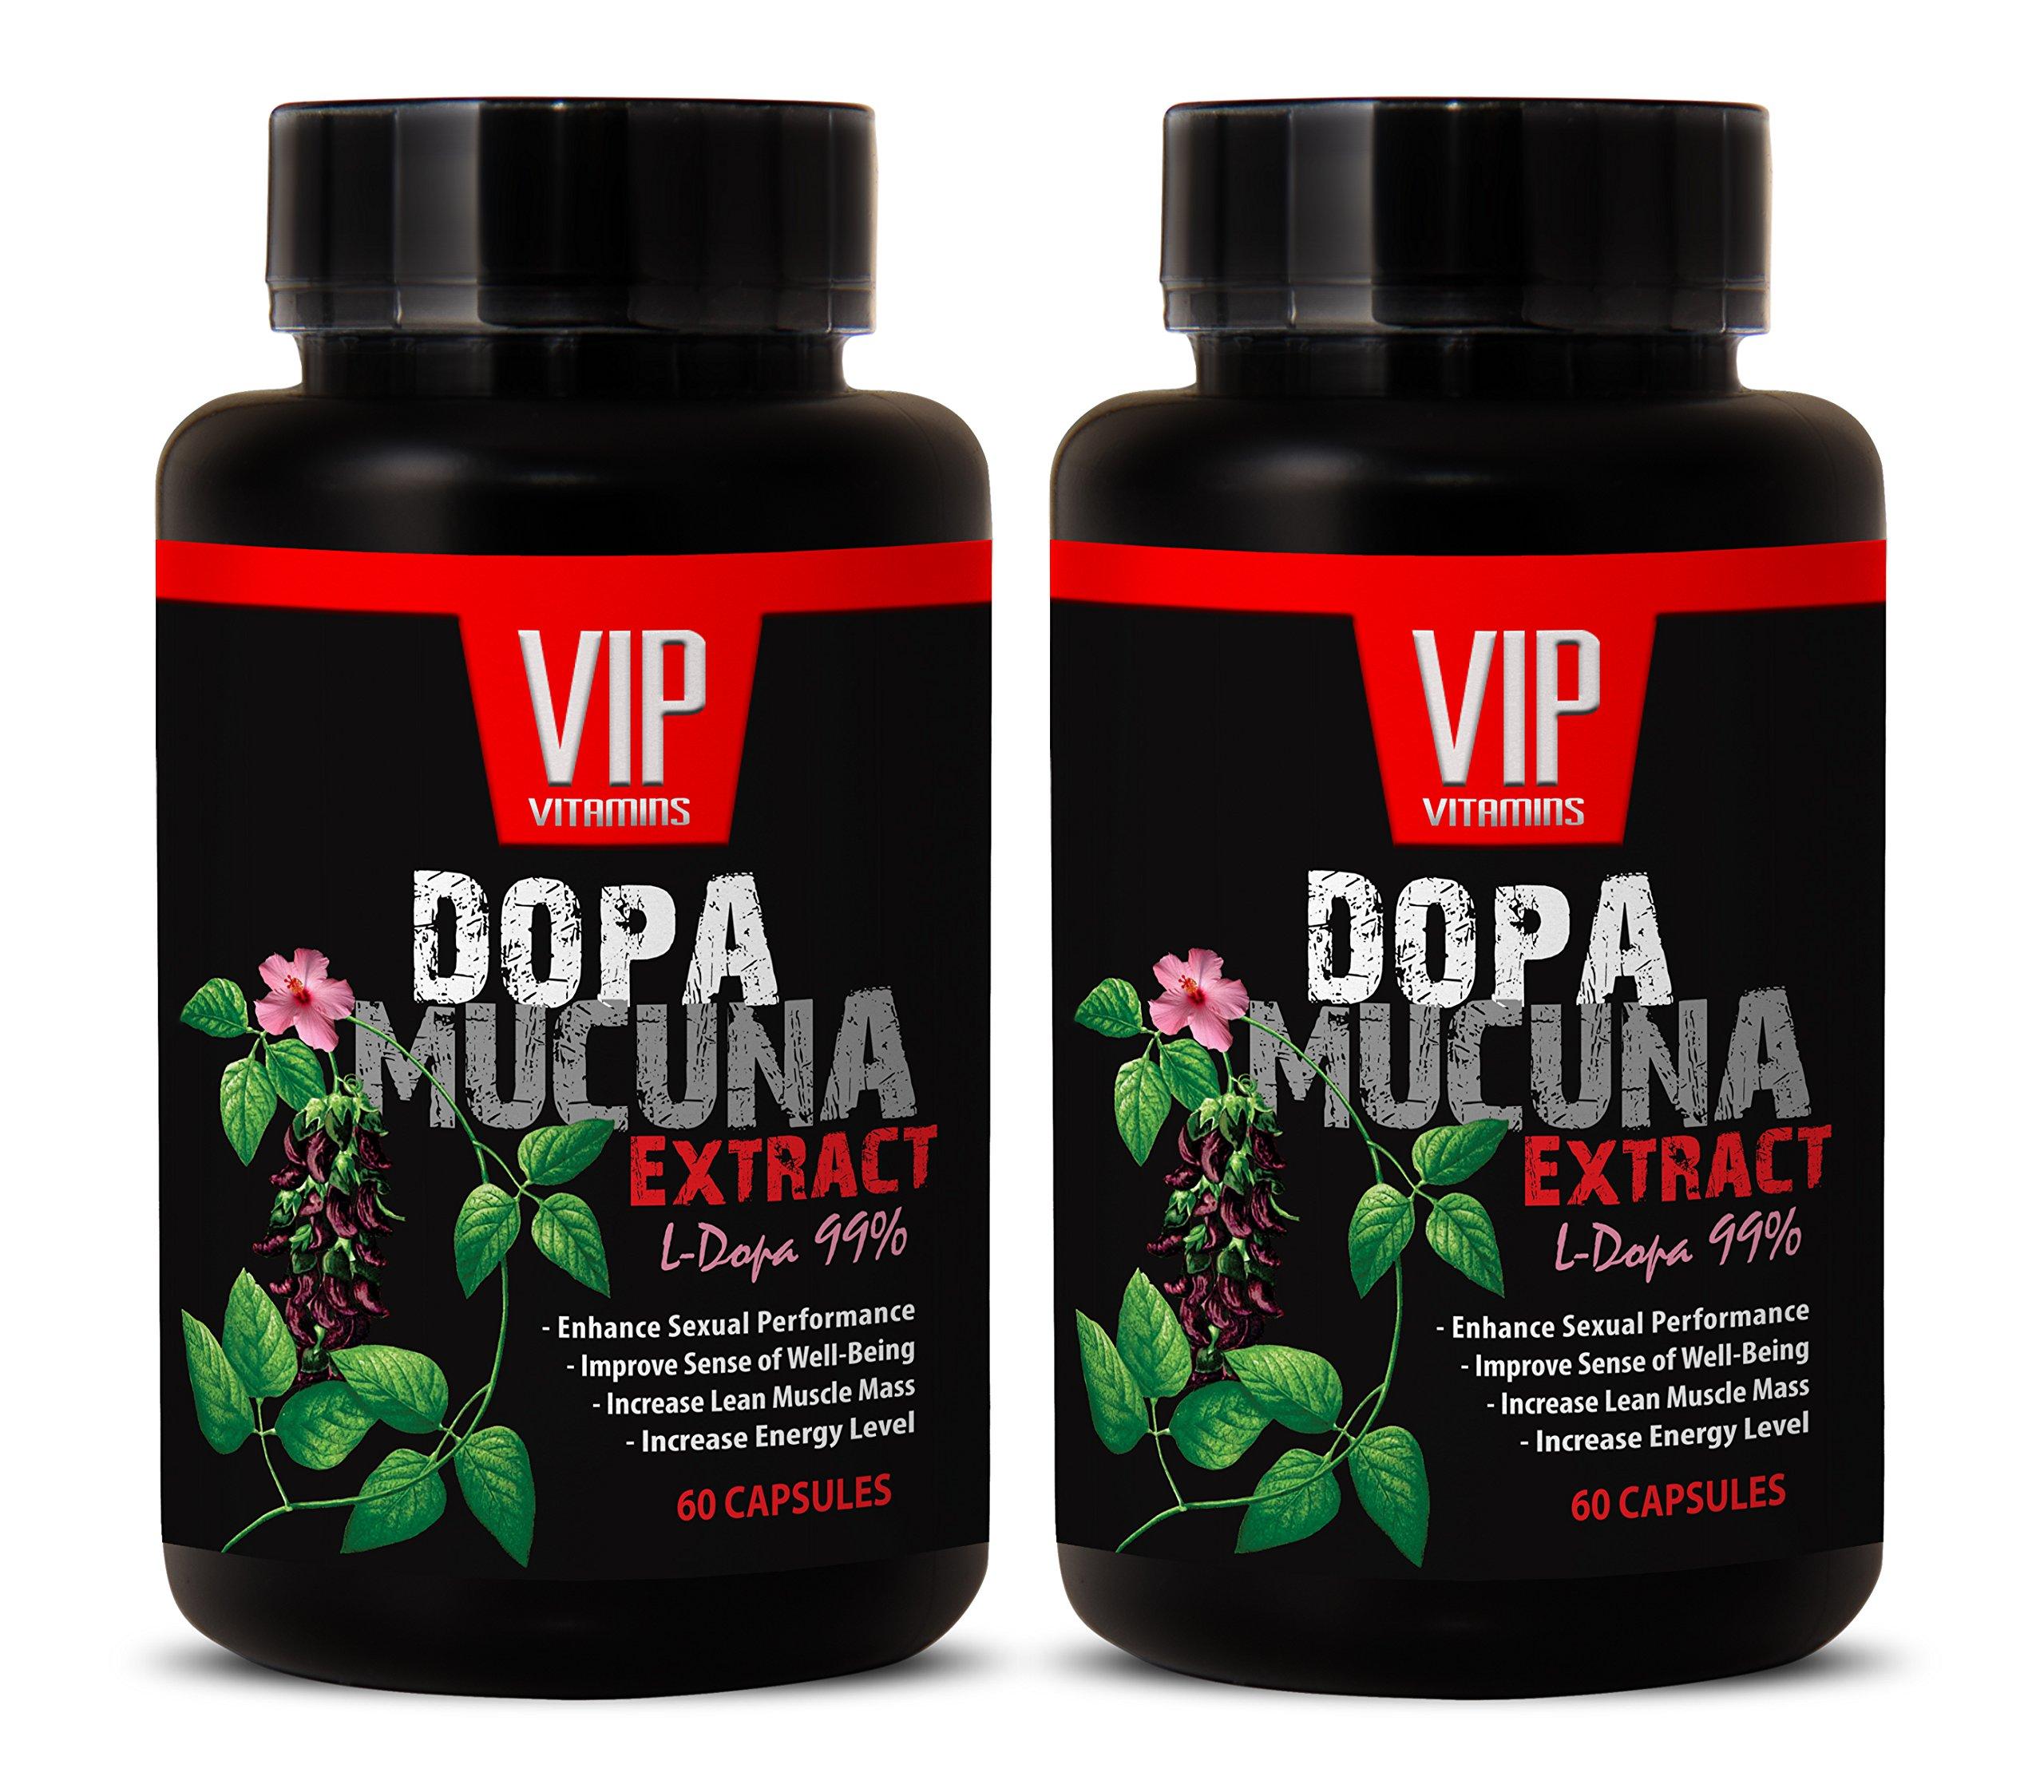 Fight depression - DOPA MUCUNA EXTRACT (L-DOPA 99%) - L-dopa - 2 Bottles 120 Capsules